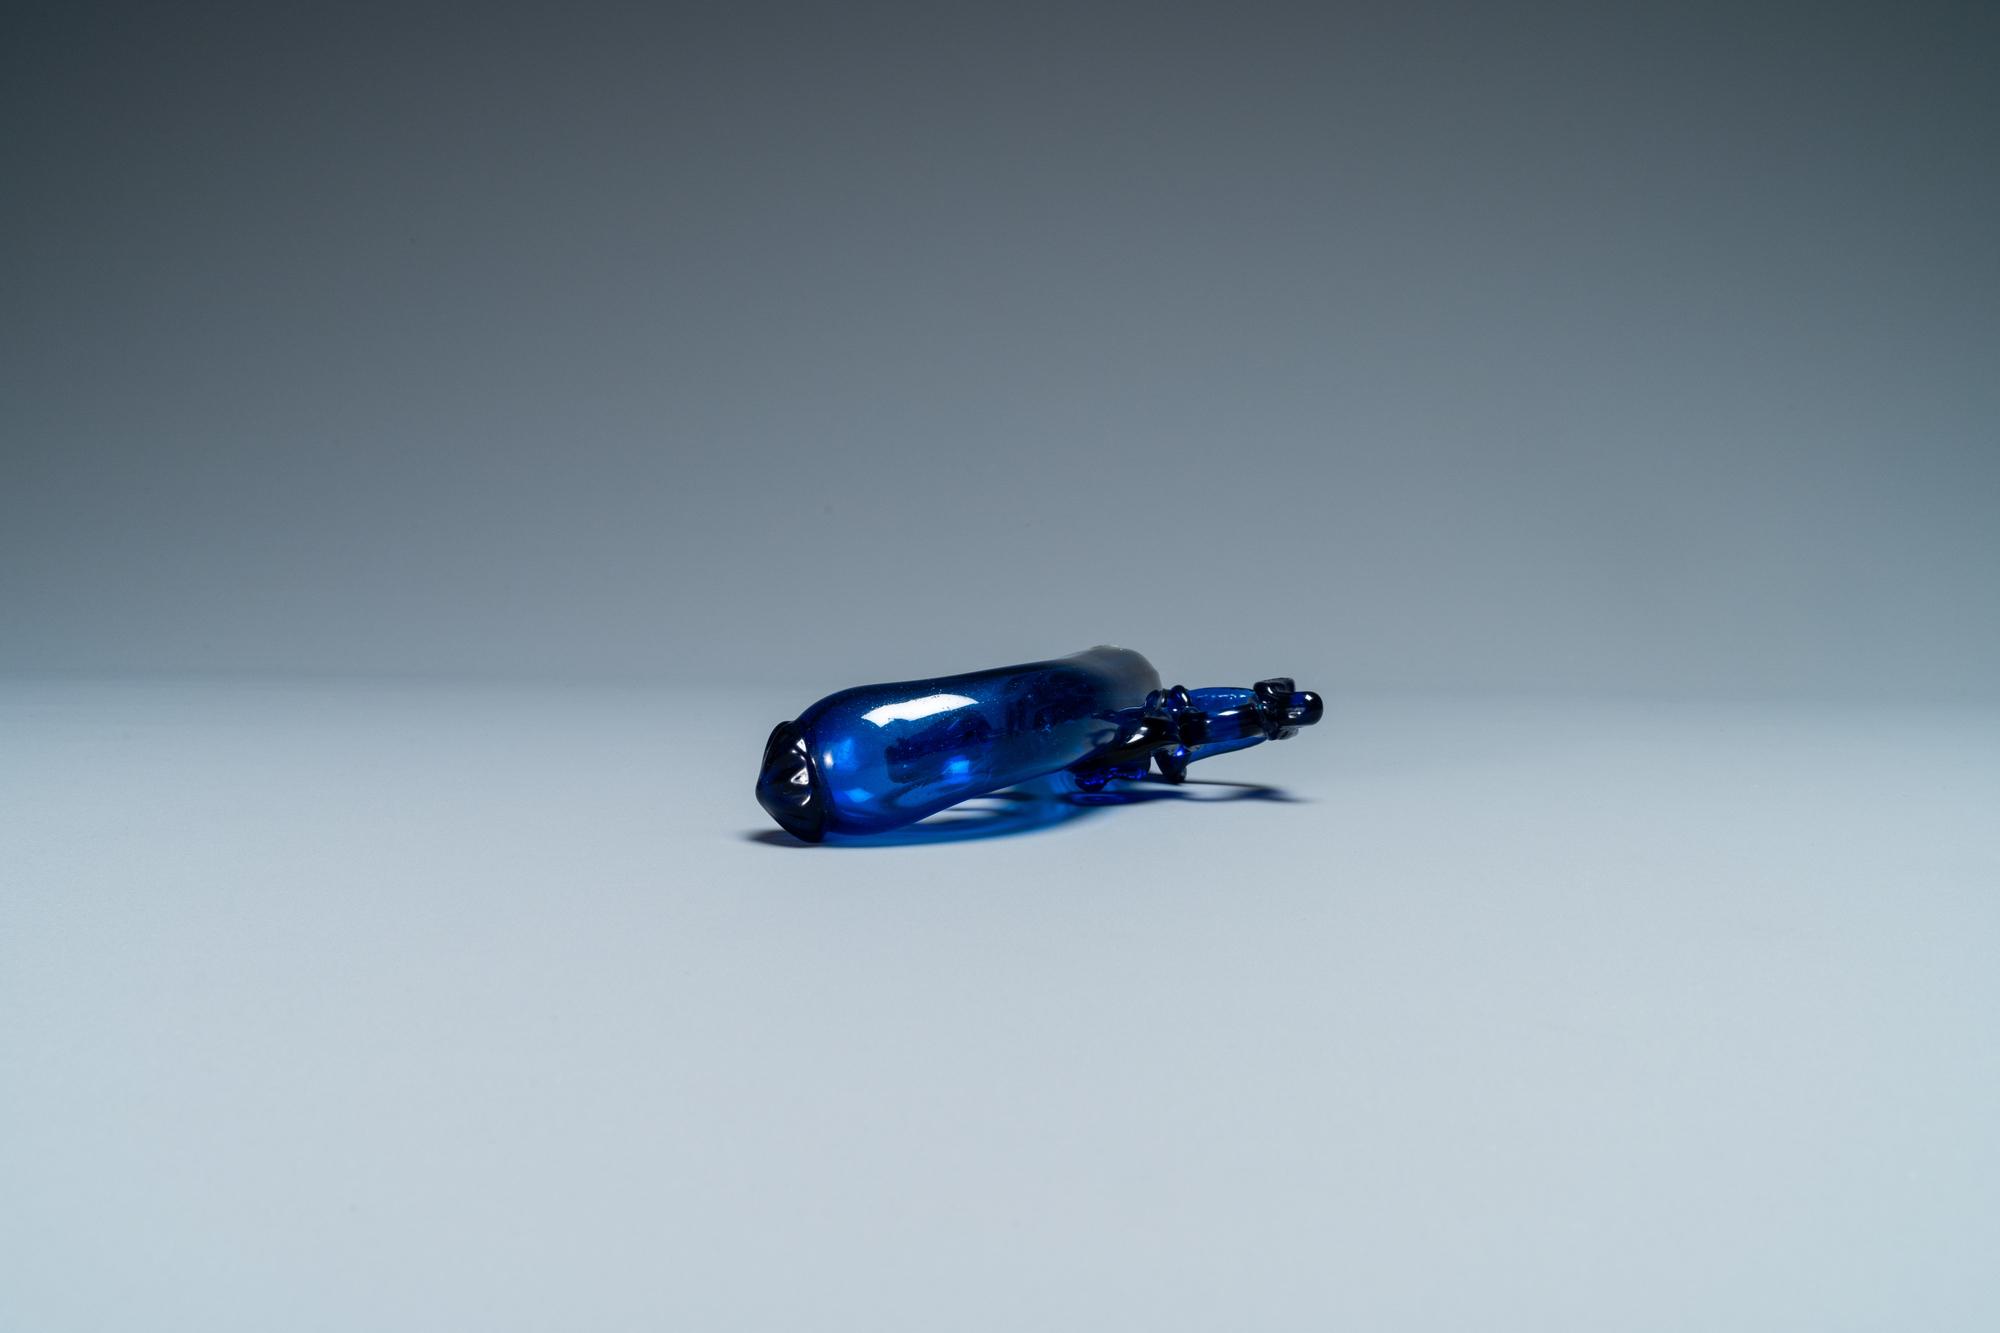 A cobalt blue glass flask in the shape of a flintlock gun, Belgium or Holland, 17th C. - Image 5 of 7